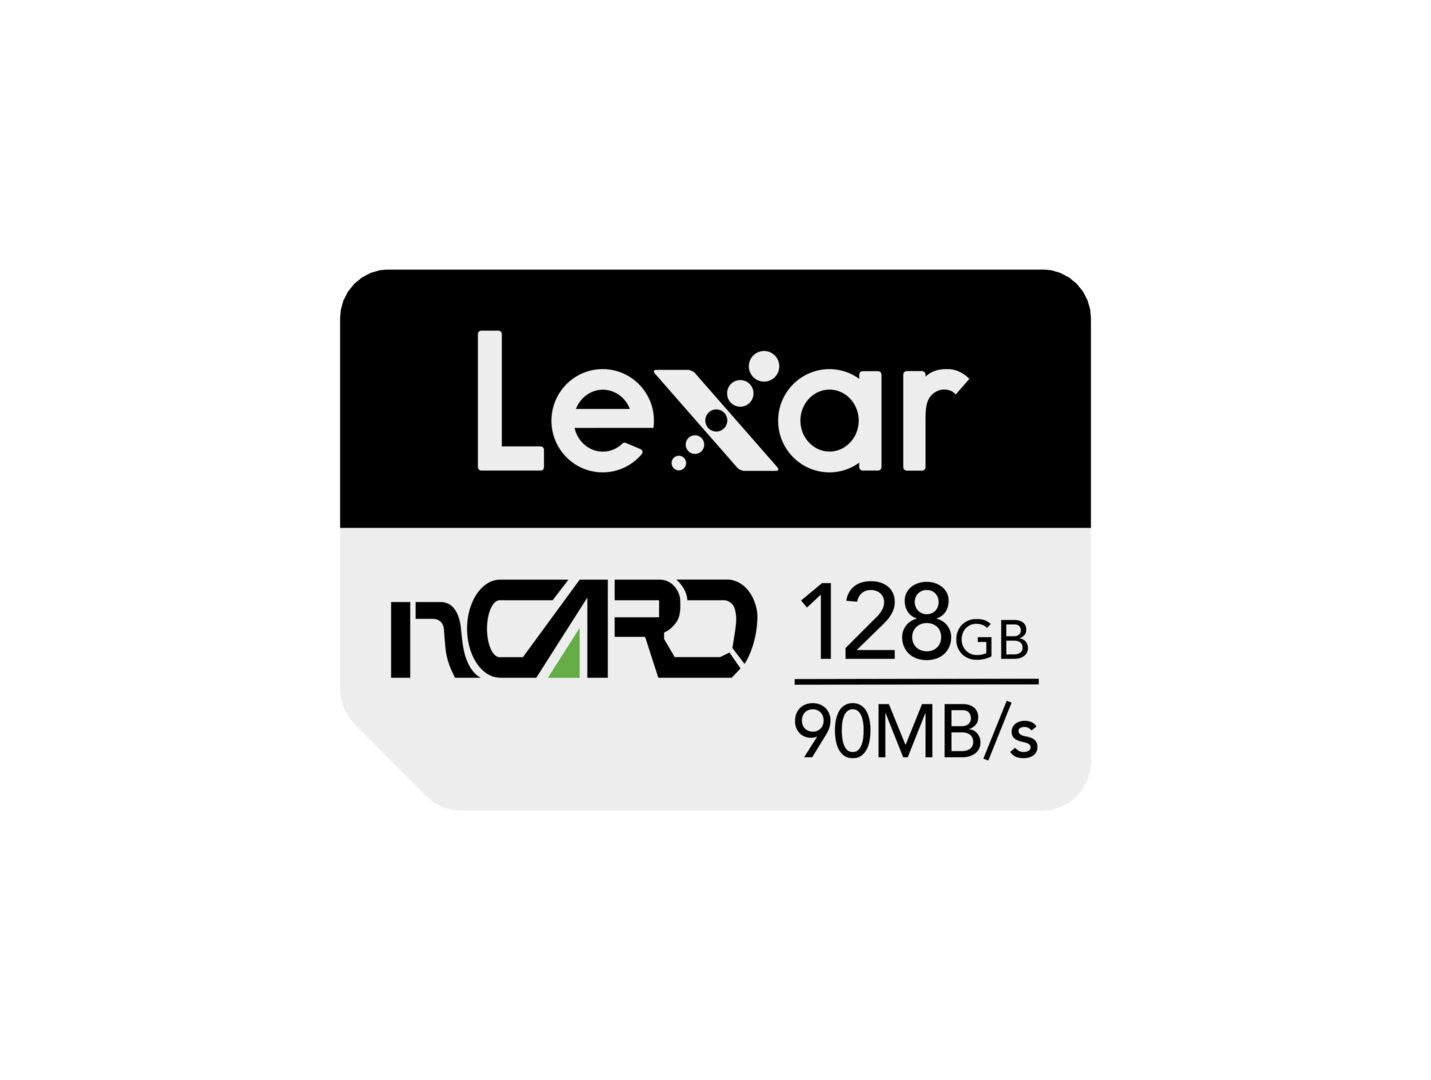 Lexar NM Card mit 128GB